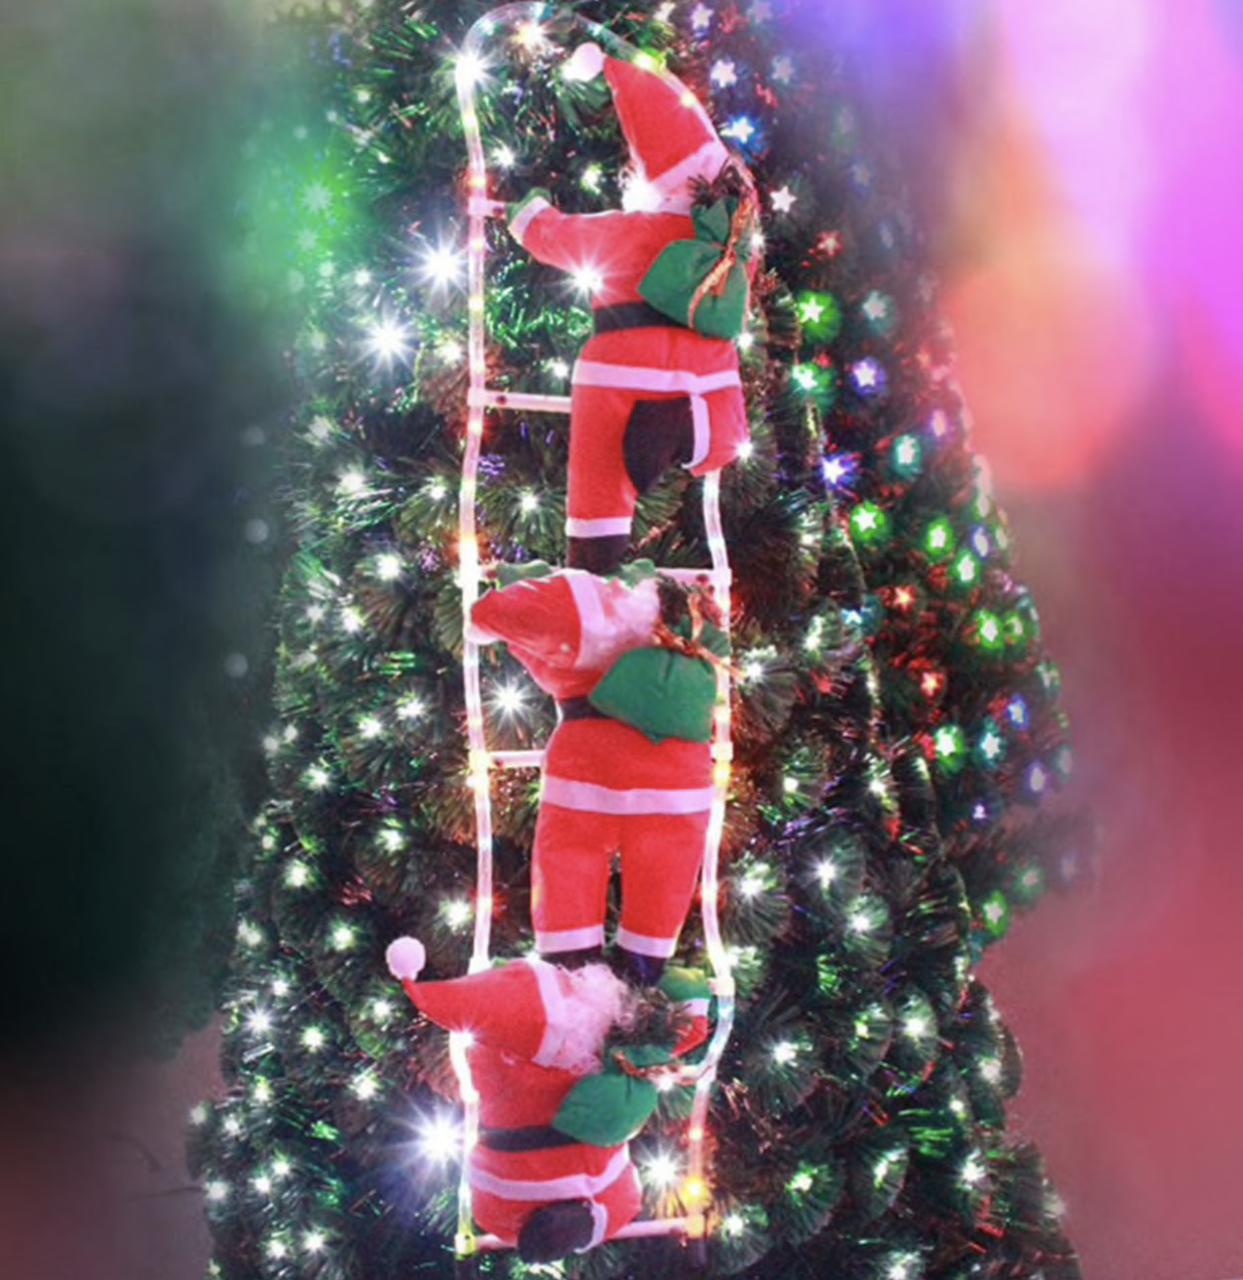 Декоративный Дед Мороз ползущий по лестнице (Санта Клаус на лестнице) 3 фигурки по 30см